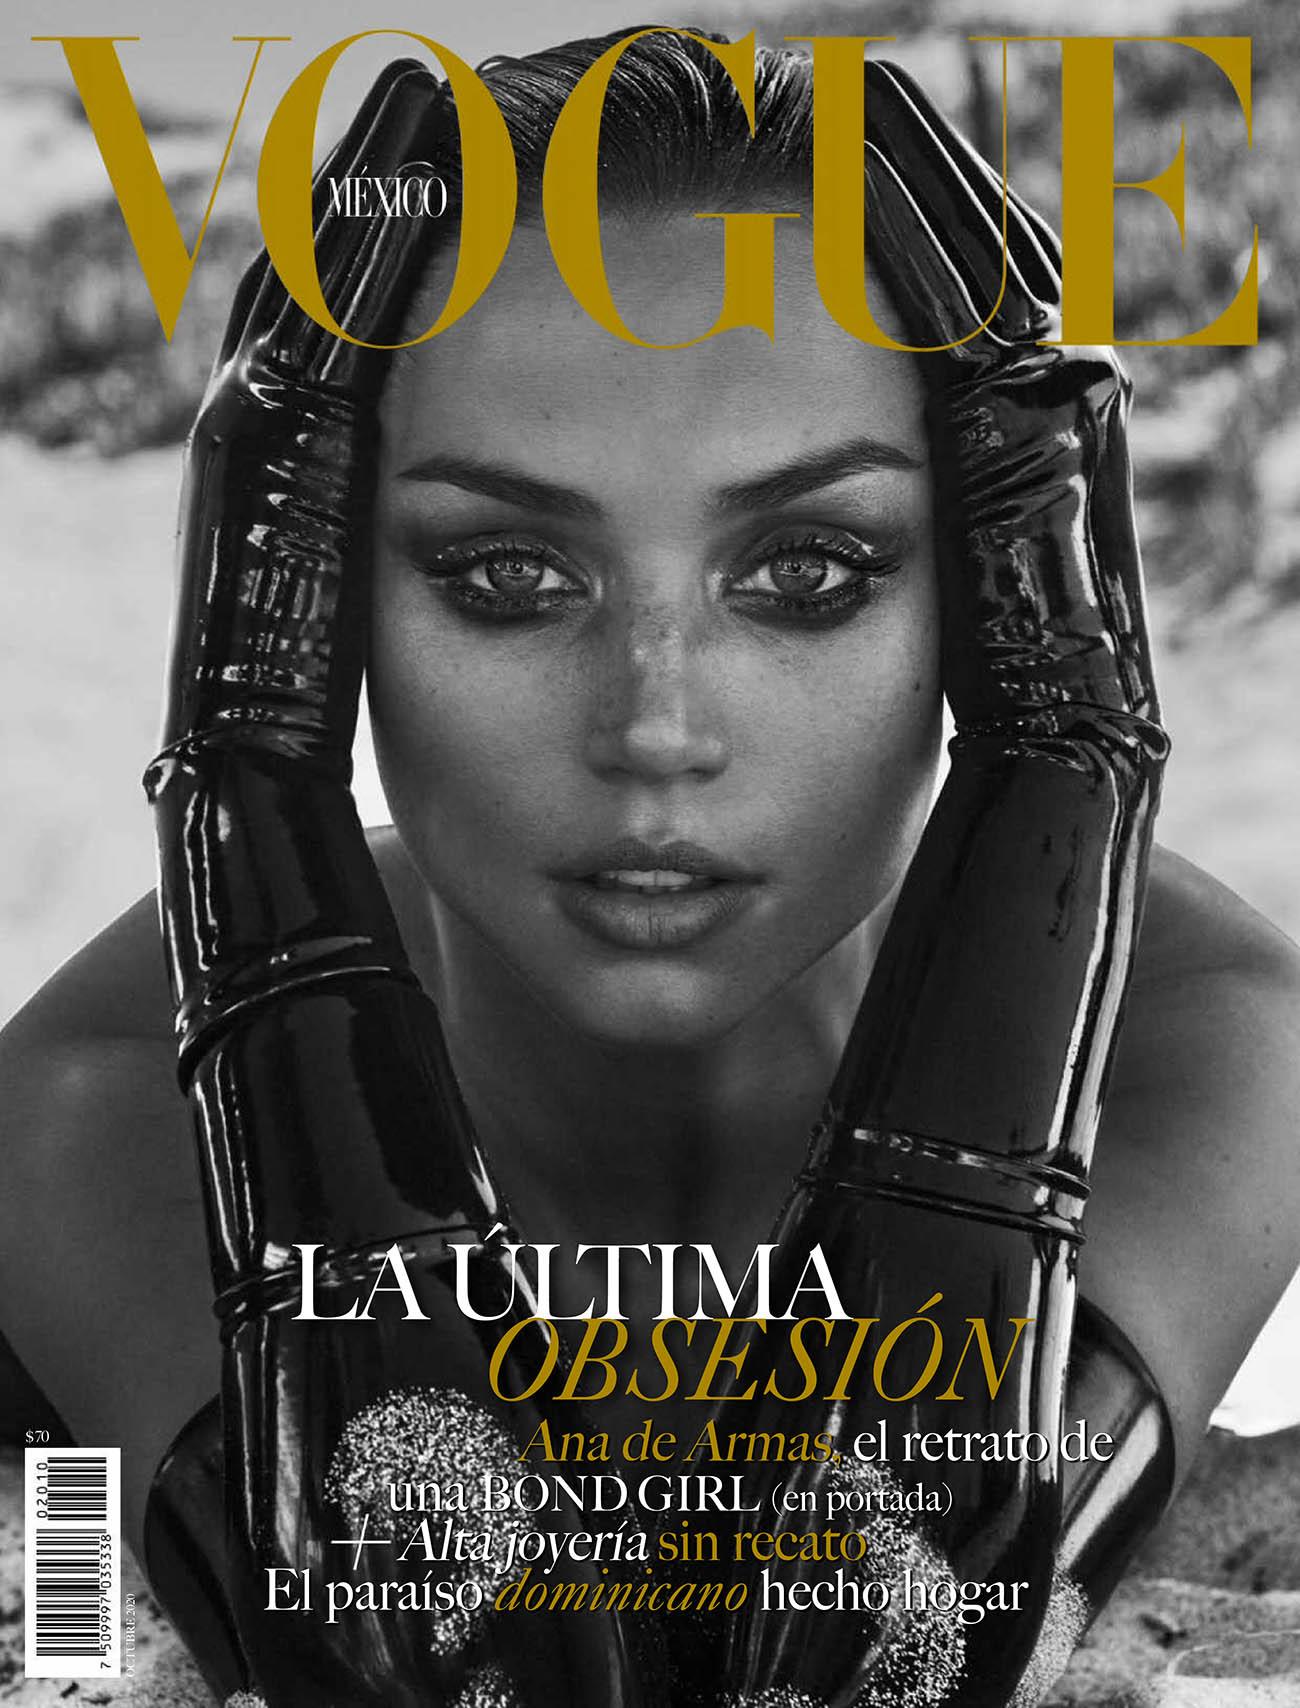 Ana de Armas covers Vogue Mexico & Latin America October 2020 by Alique